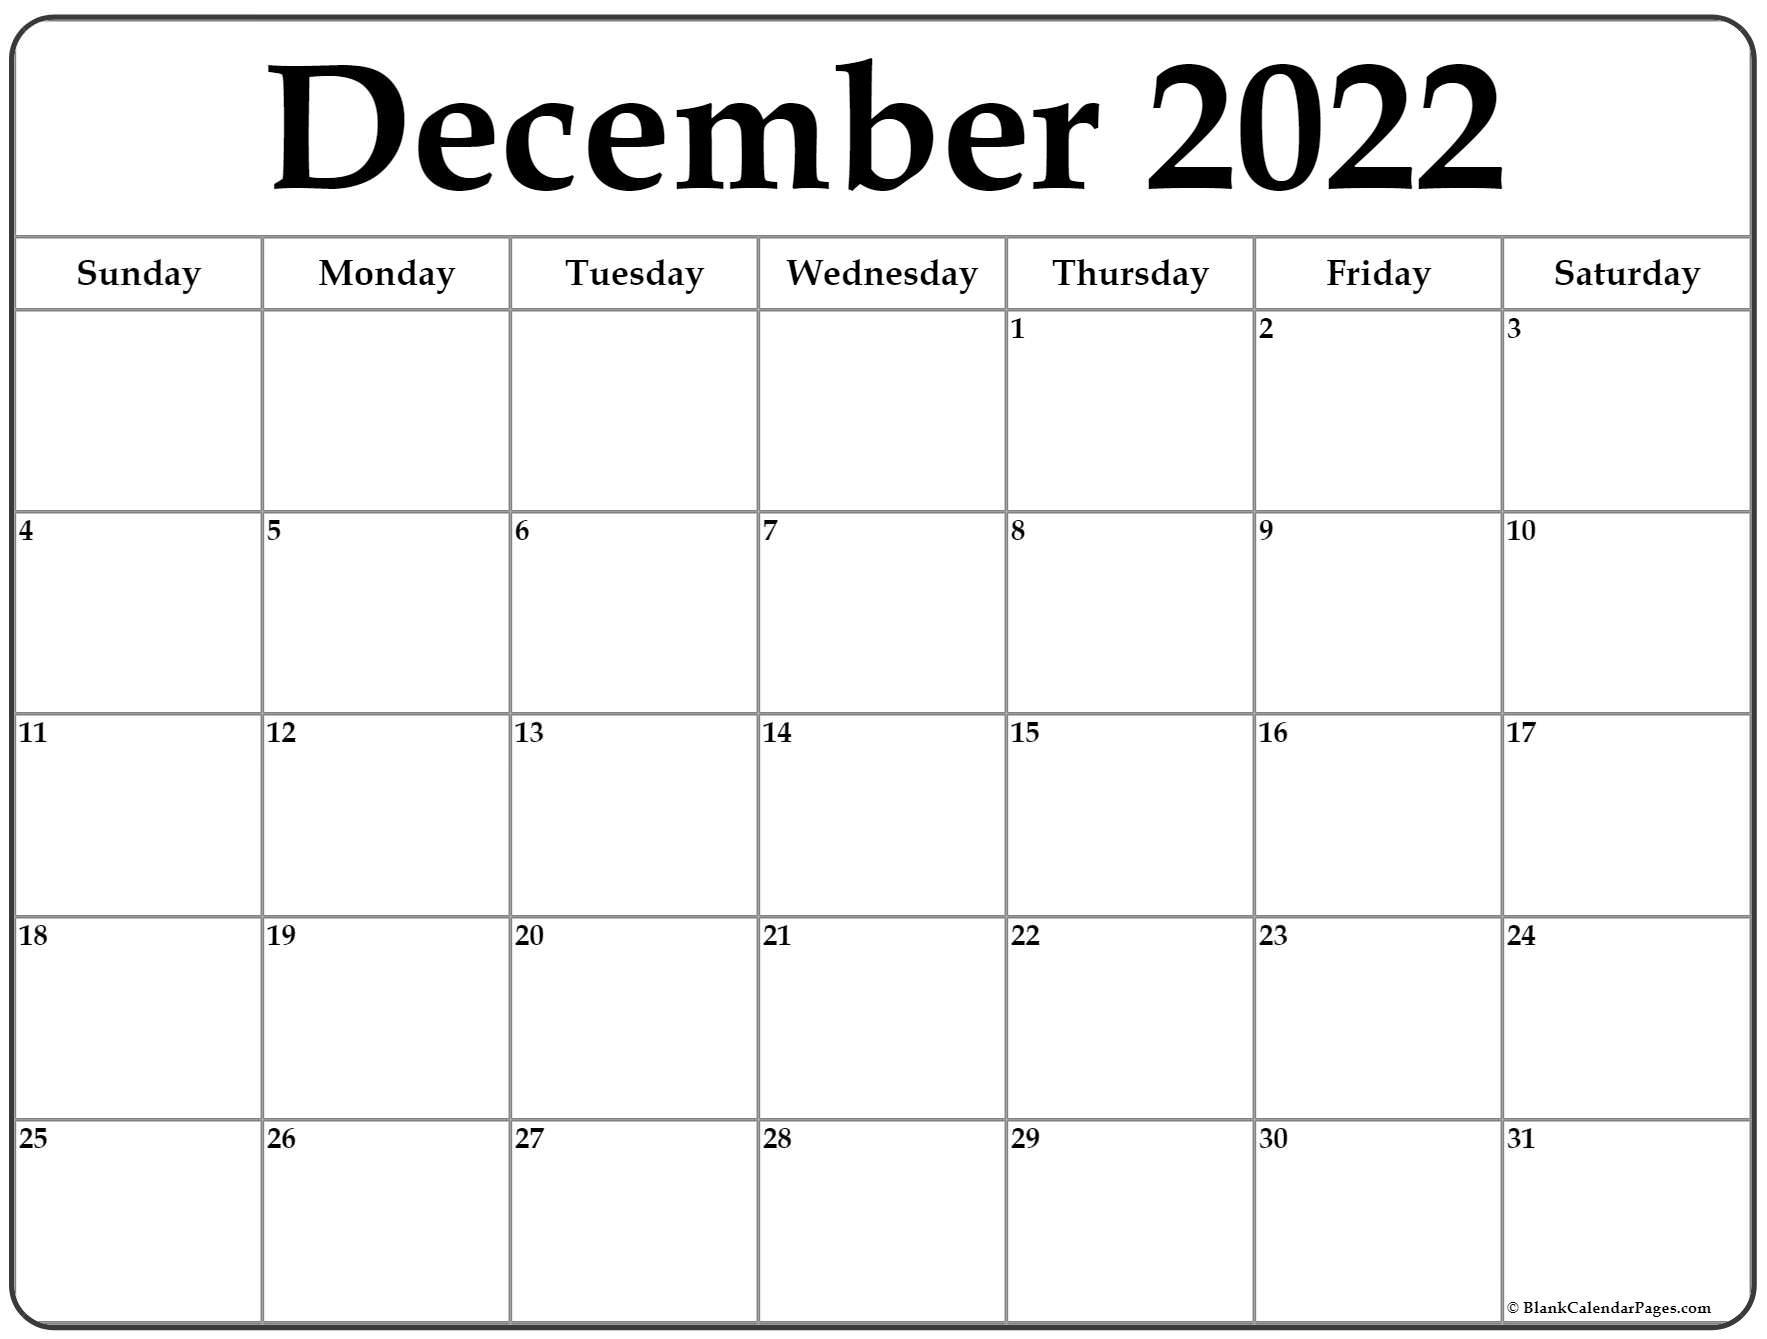 Dec Calendar 2022 Printable.December 2022 Calendar Free Printable Calendar Templates